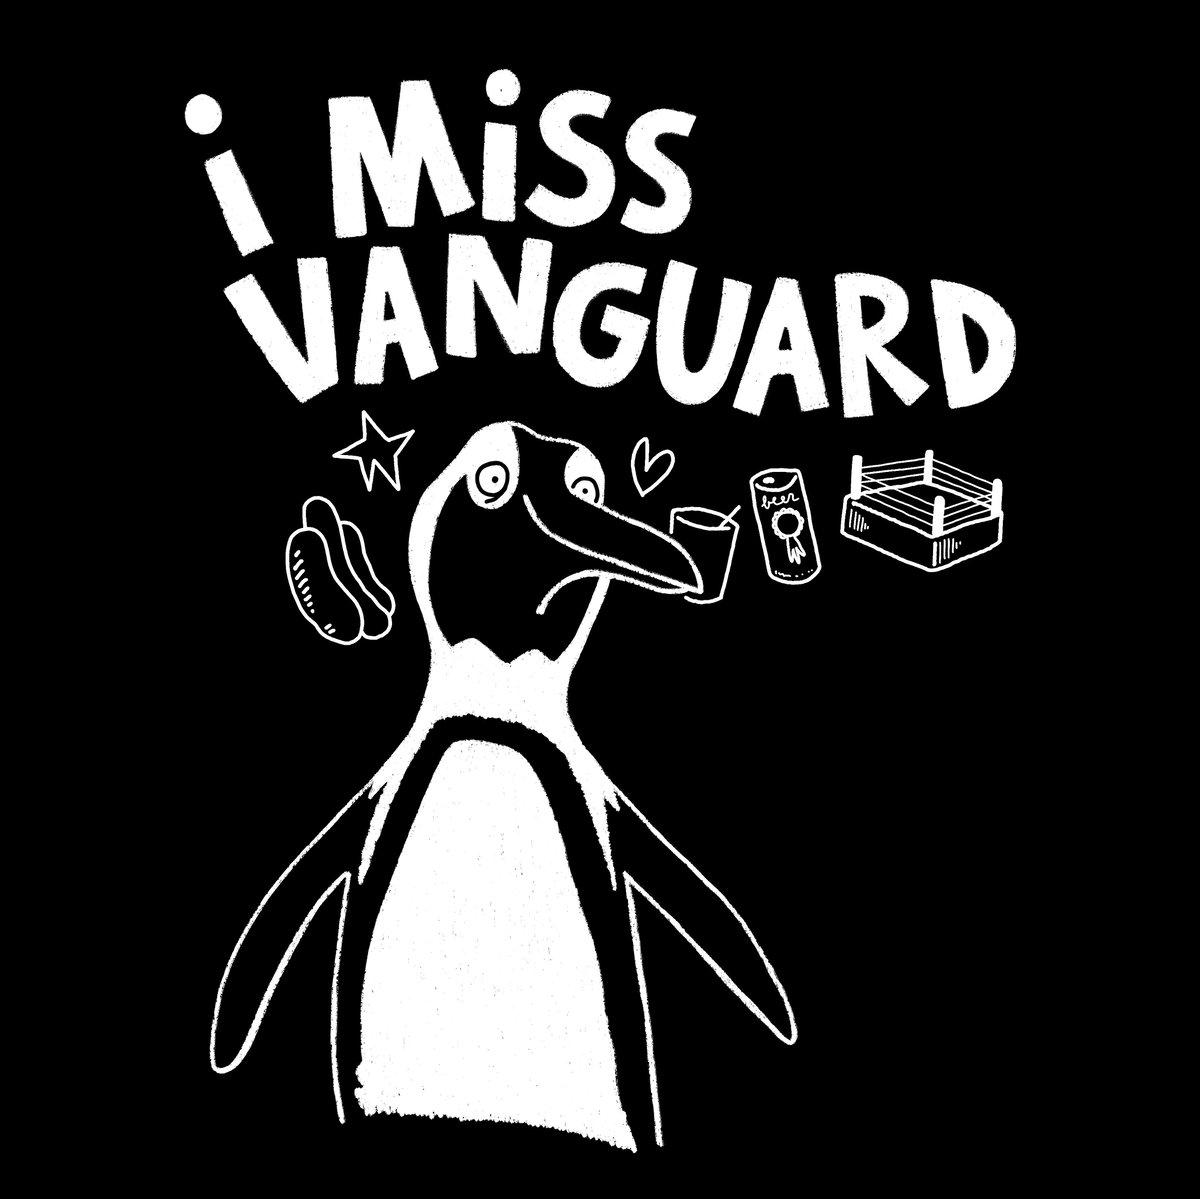 I MISS VANGUARD (PENGIE -T)